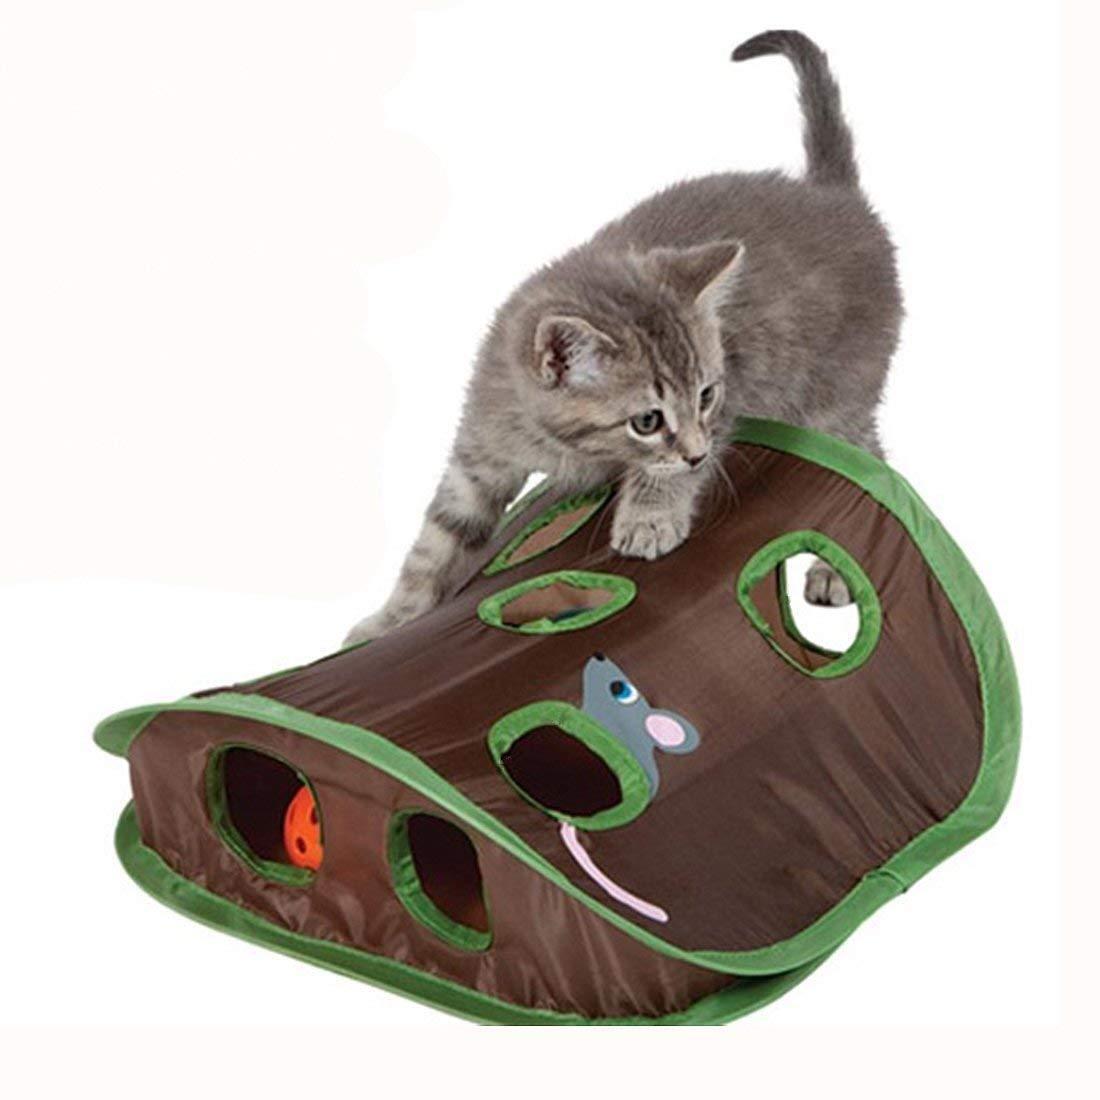 Katzenspielzeug set katzen Maus Rattenloch Interaktives Spielzeug Cat Toy